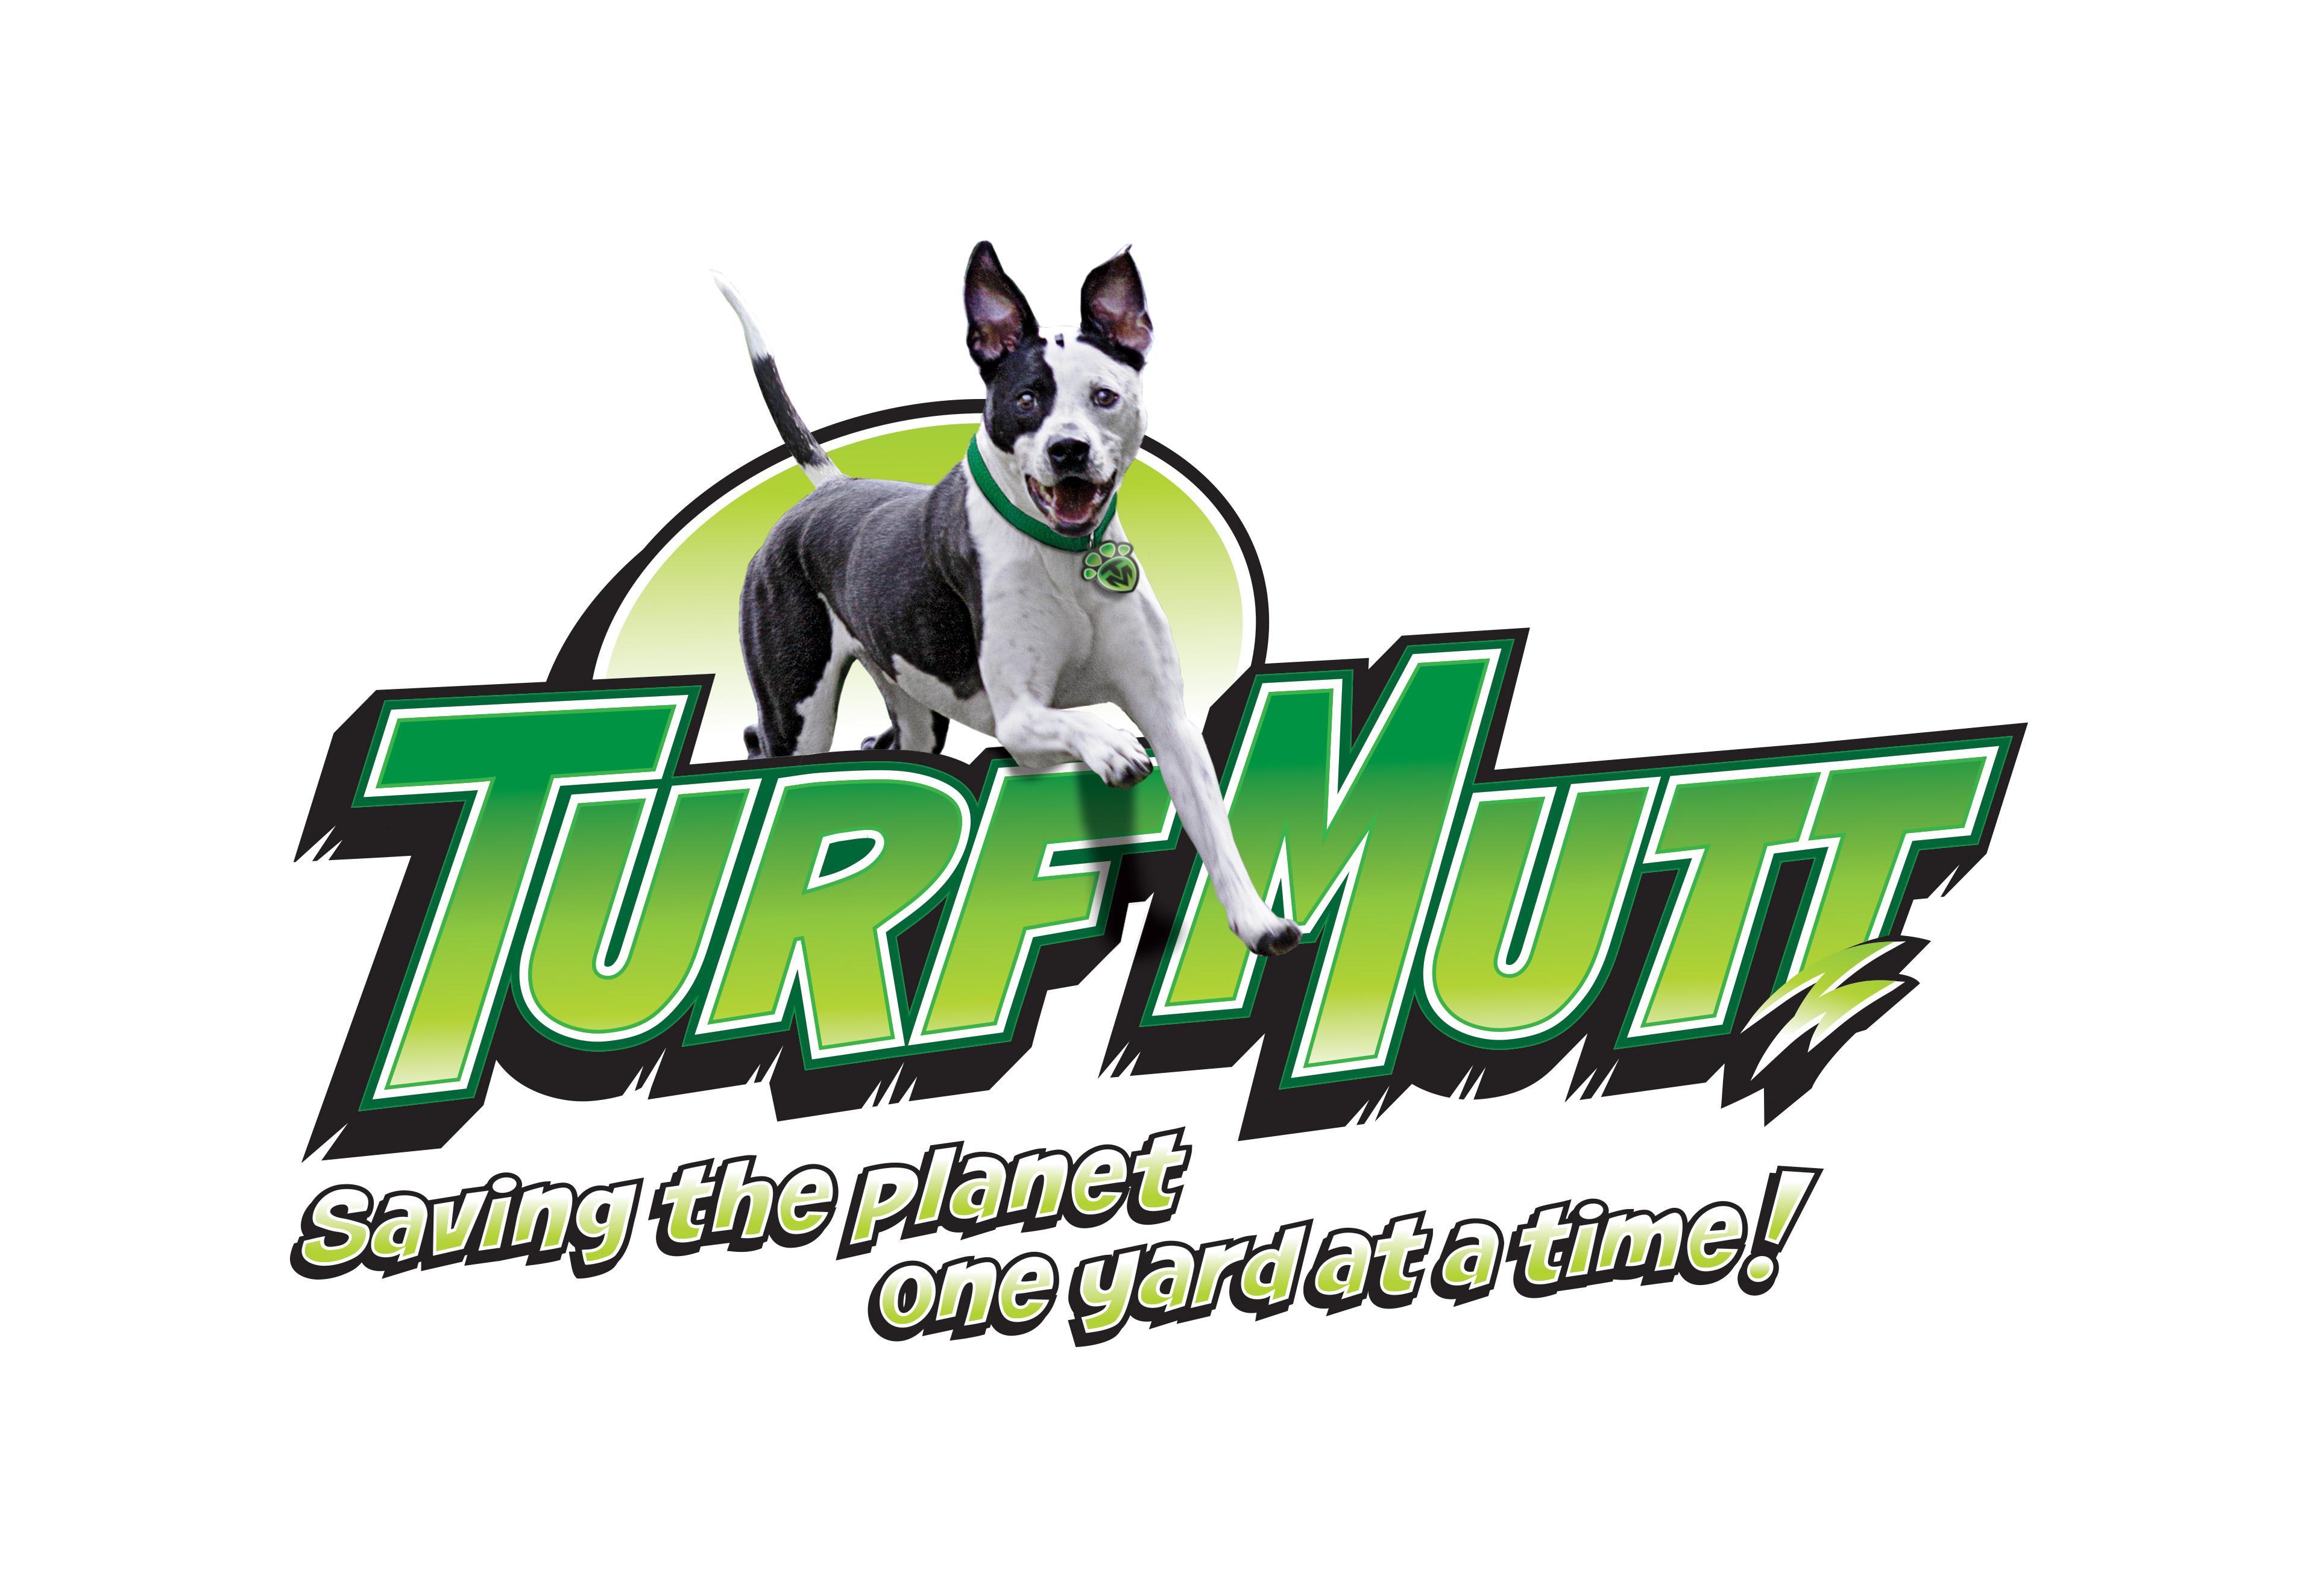 Reminder: Deadline Monday, Jan. 23: Submit Educational Contest Entries #TurfMutt